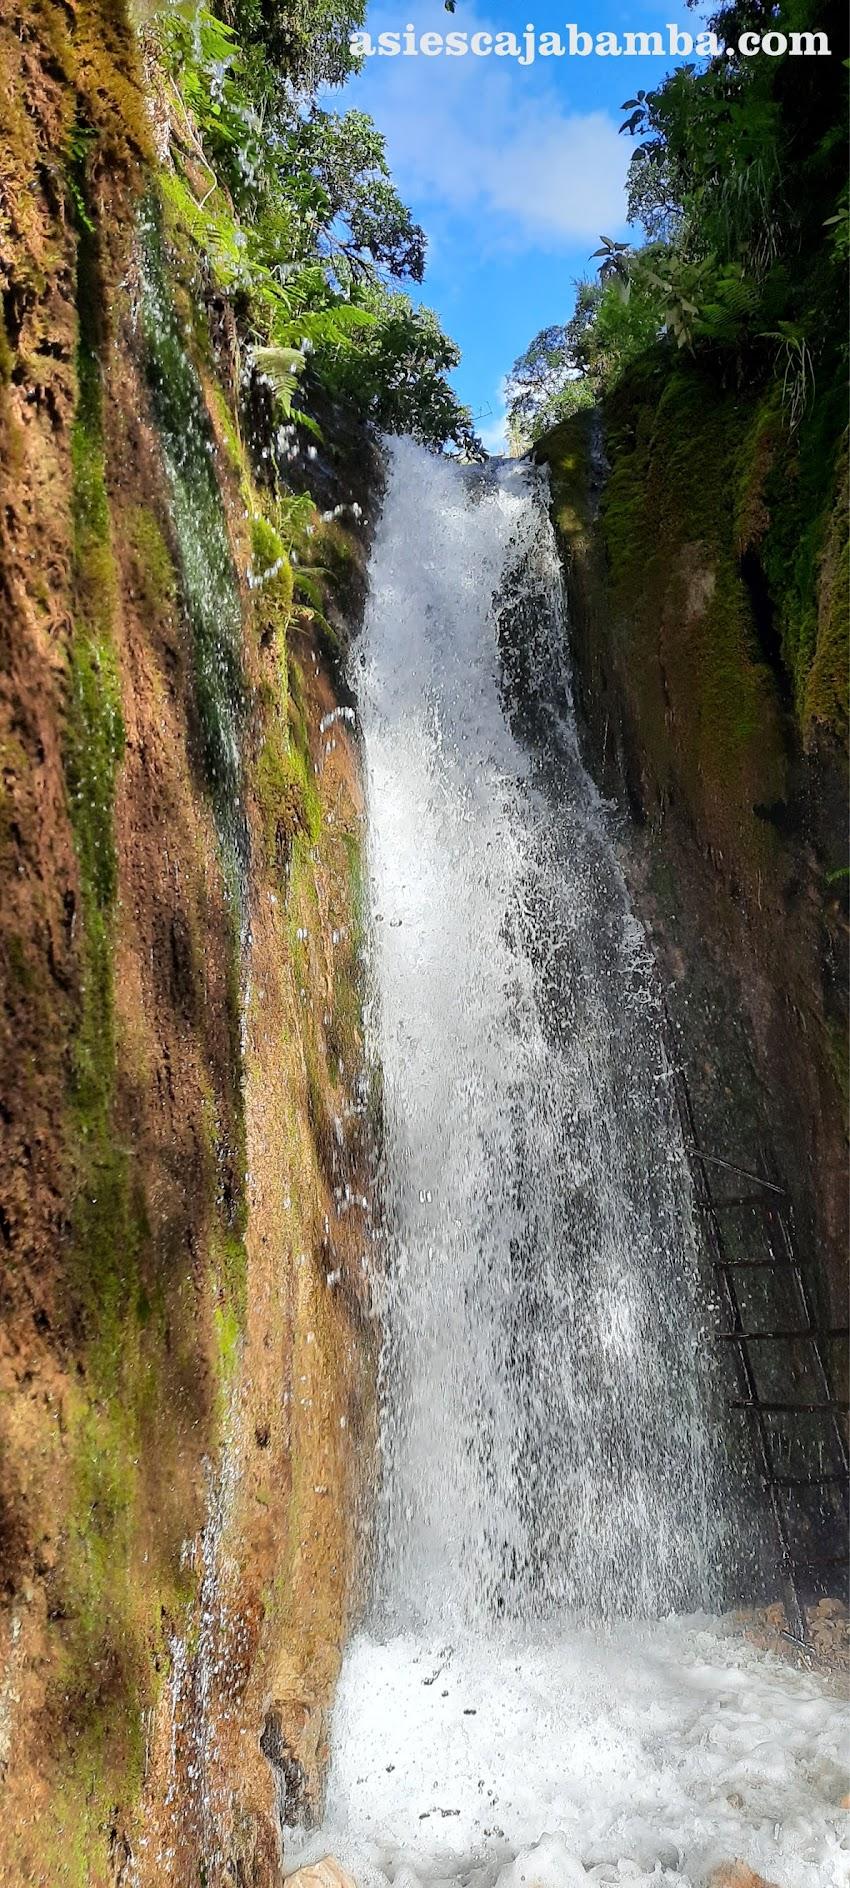 Los Tres Chorros de Pingo – Cajabamba + FOTOS